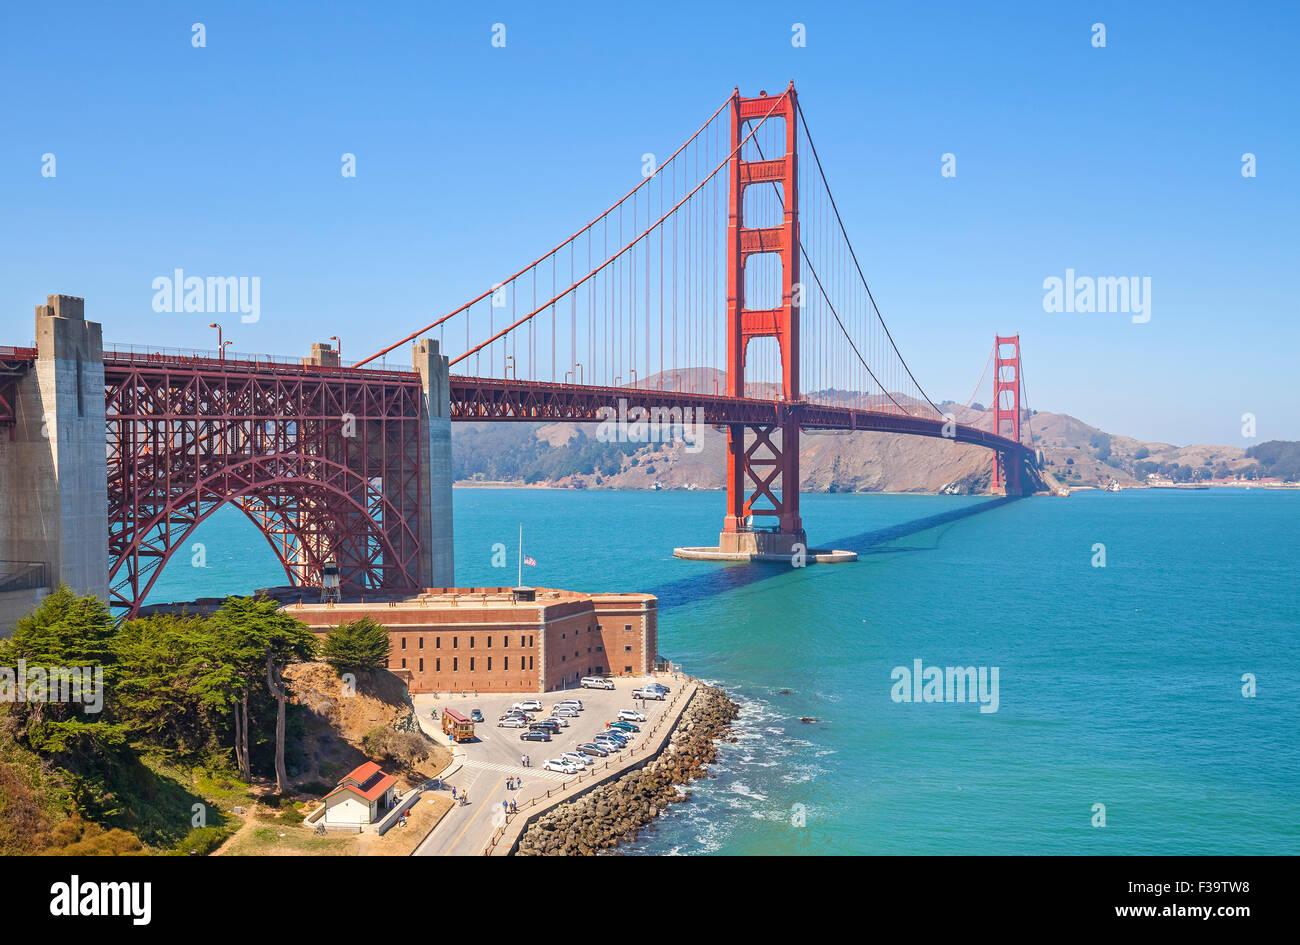 Puente Golden Gate en San Francisco, Estados Unidos. Imagen De Stock